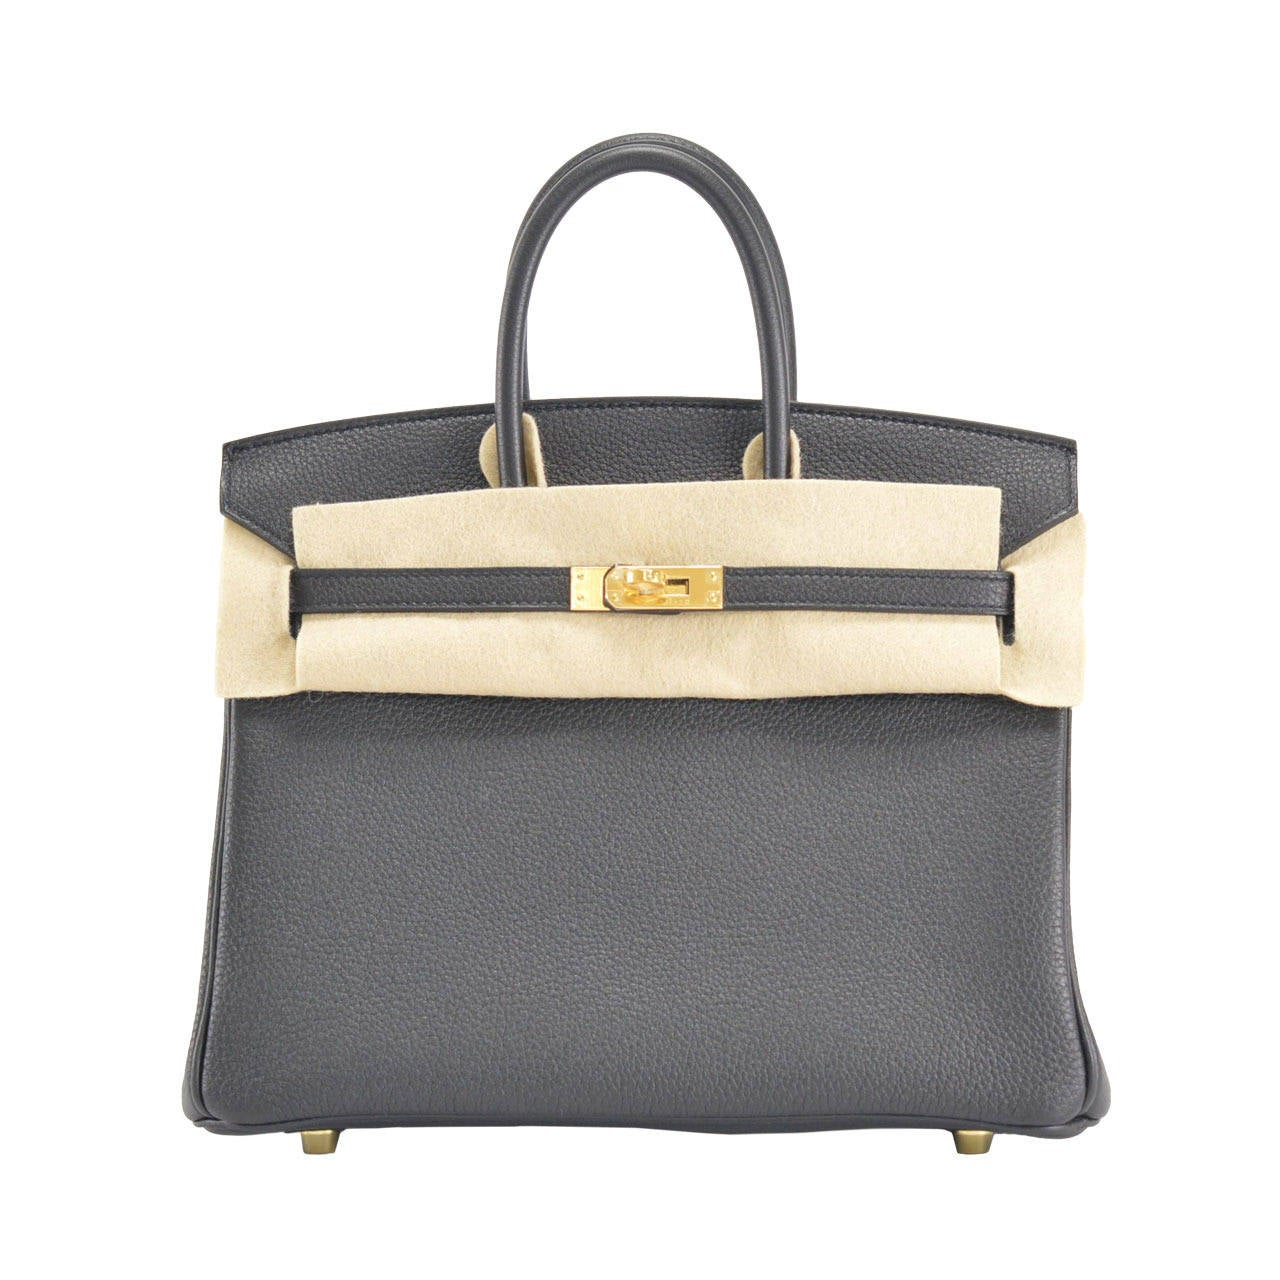 brighton knockoffs - HERMES Handbag BIRKIN 25 TOGO BLACK GOLD Hardware at 1stdibs